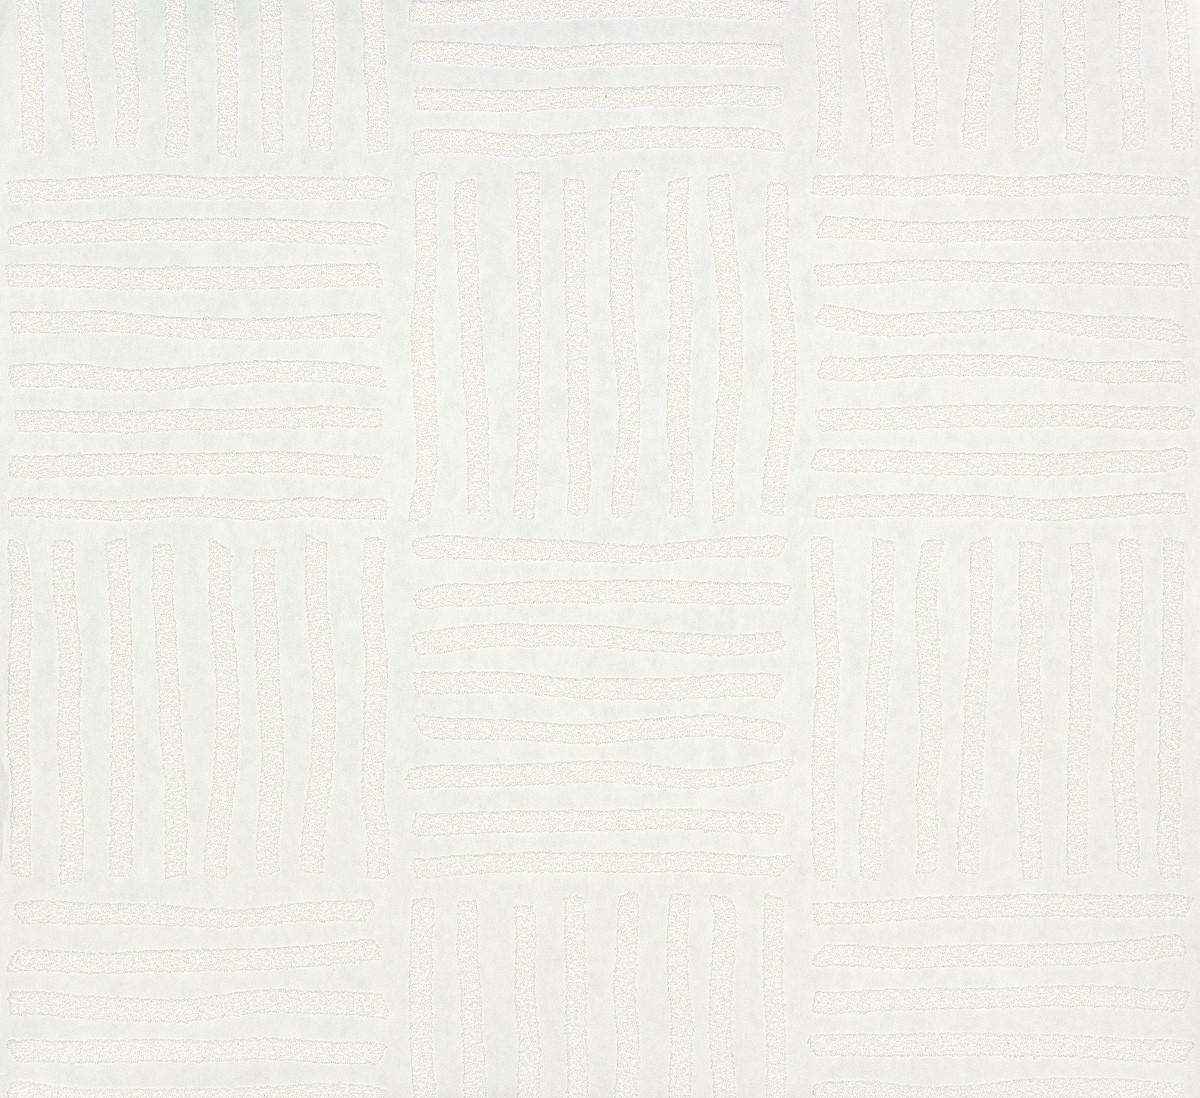 vliestapete berstreichbar streifen wei patent decor 3d 9464. Black Bedroom Furniture Sets. Home Design Ideas